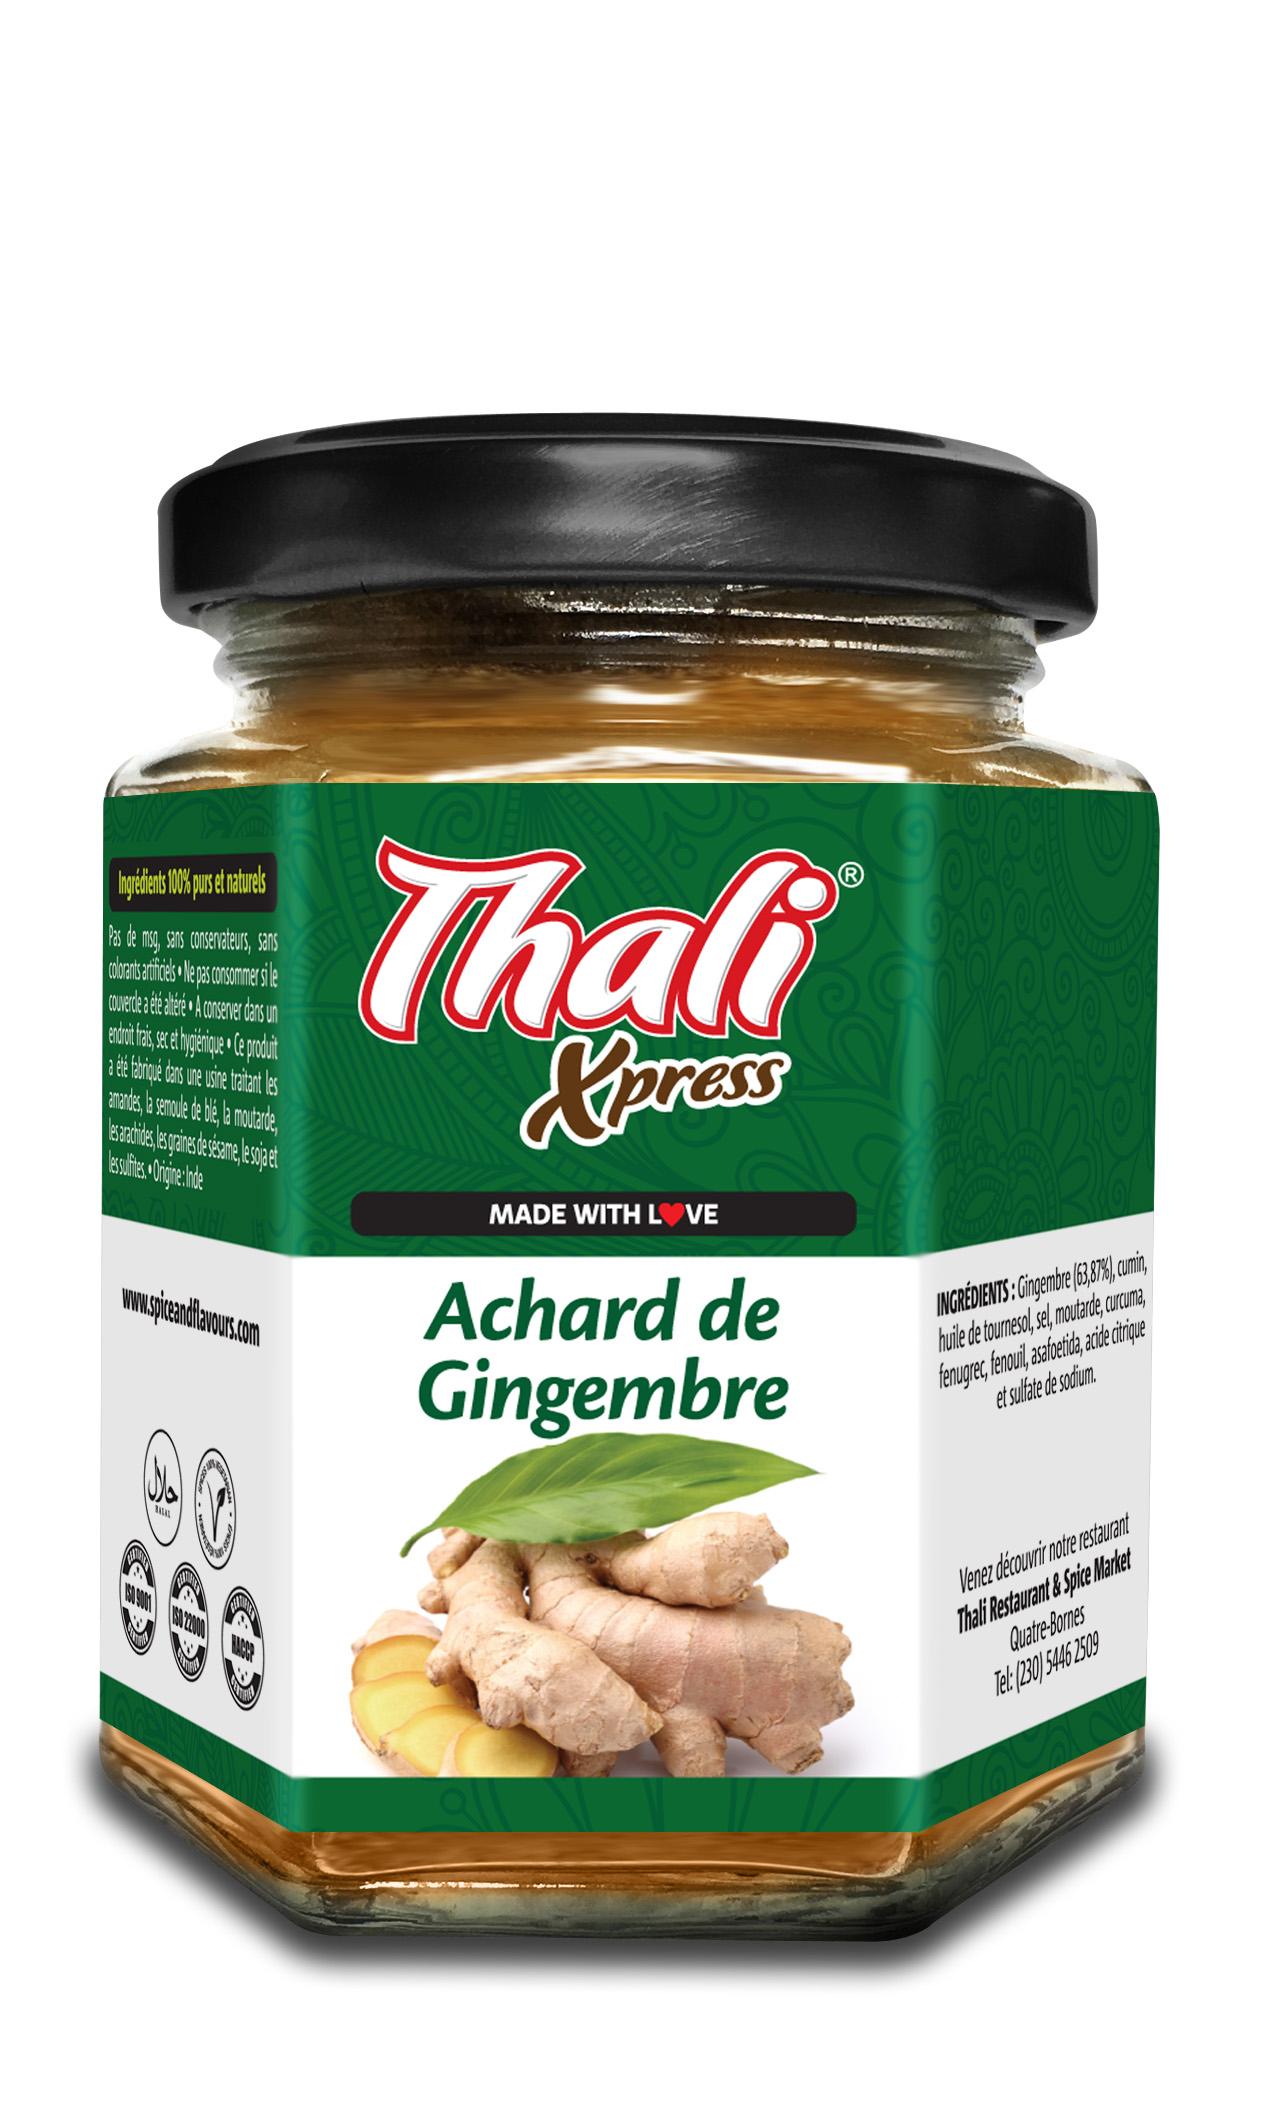 Achard de Gingembre Image